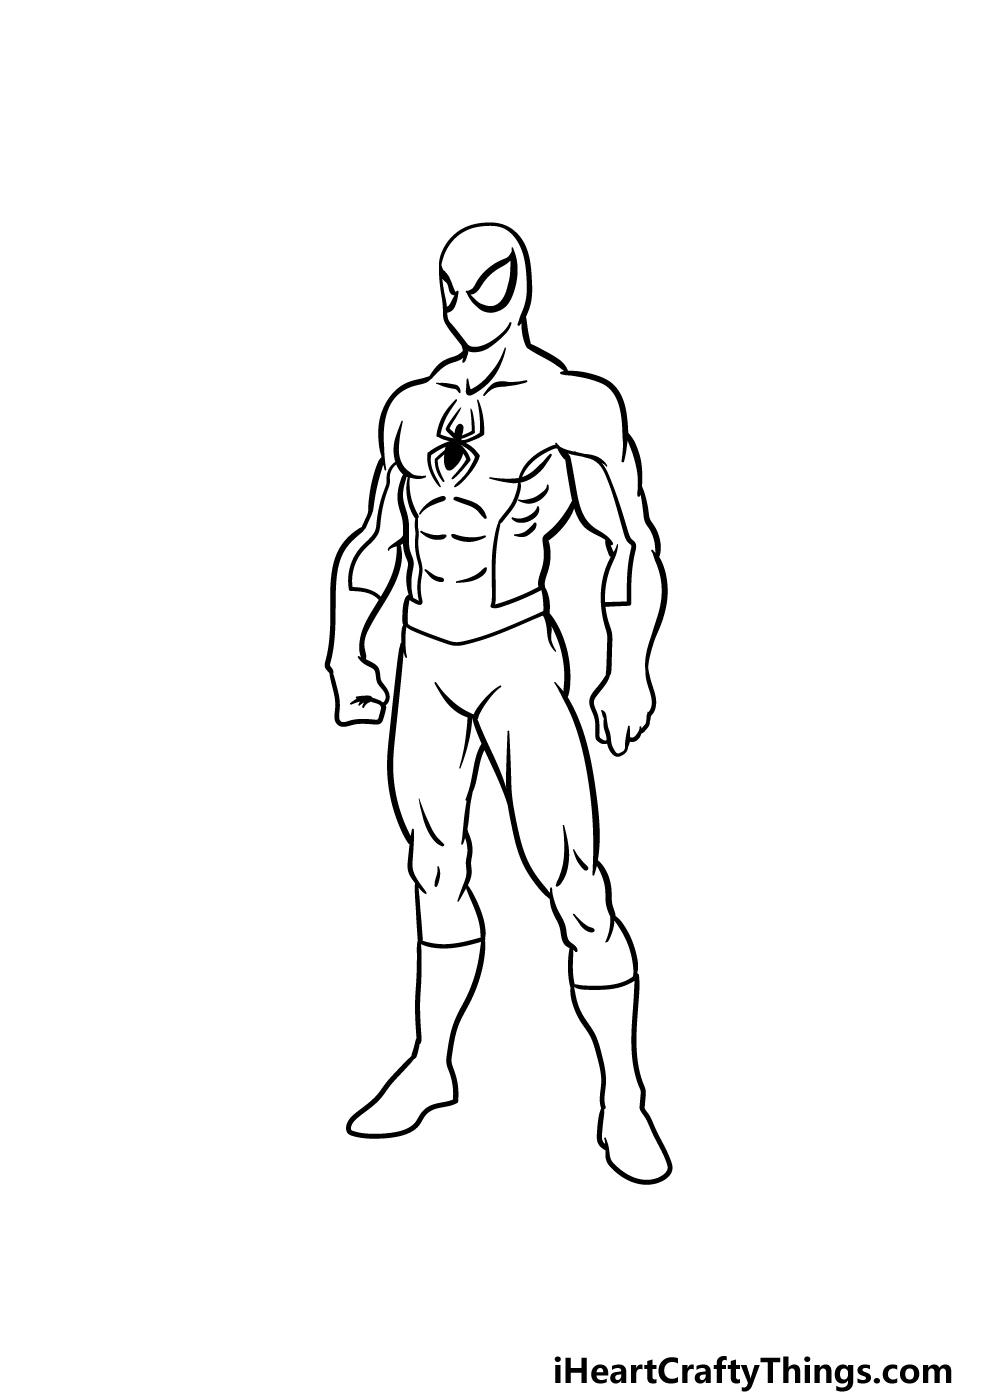 drawing Spiderman step 4